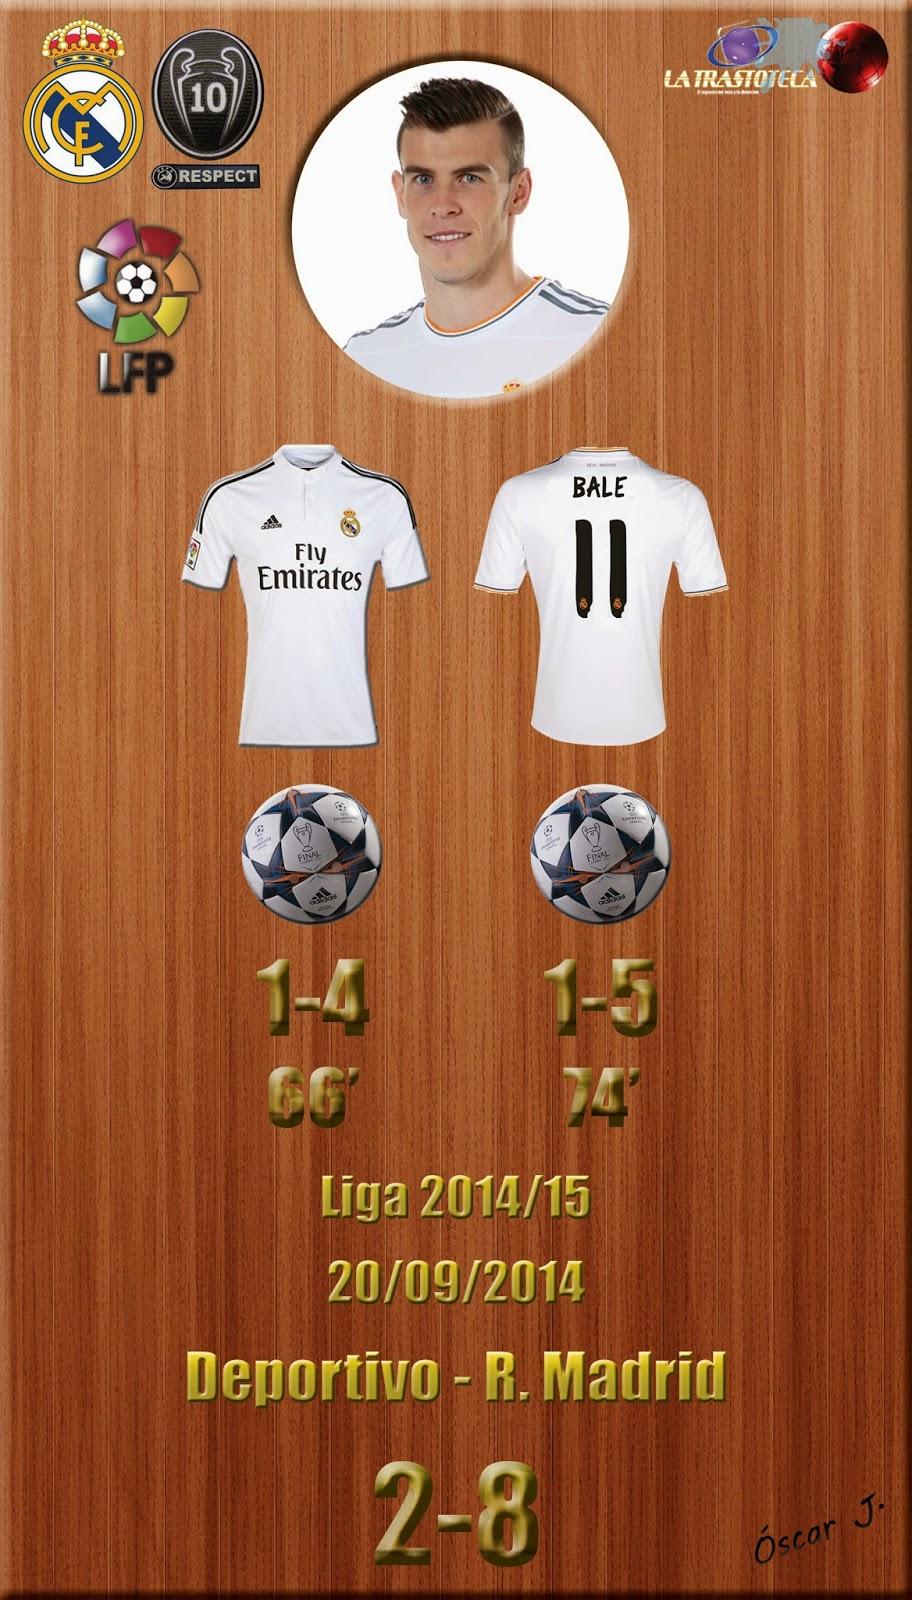 Gareth Bale (Un Doblete de un profesional) - Liga 2014/15. Jornada 4 (20/09/2014)